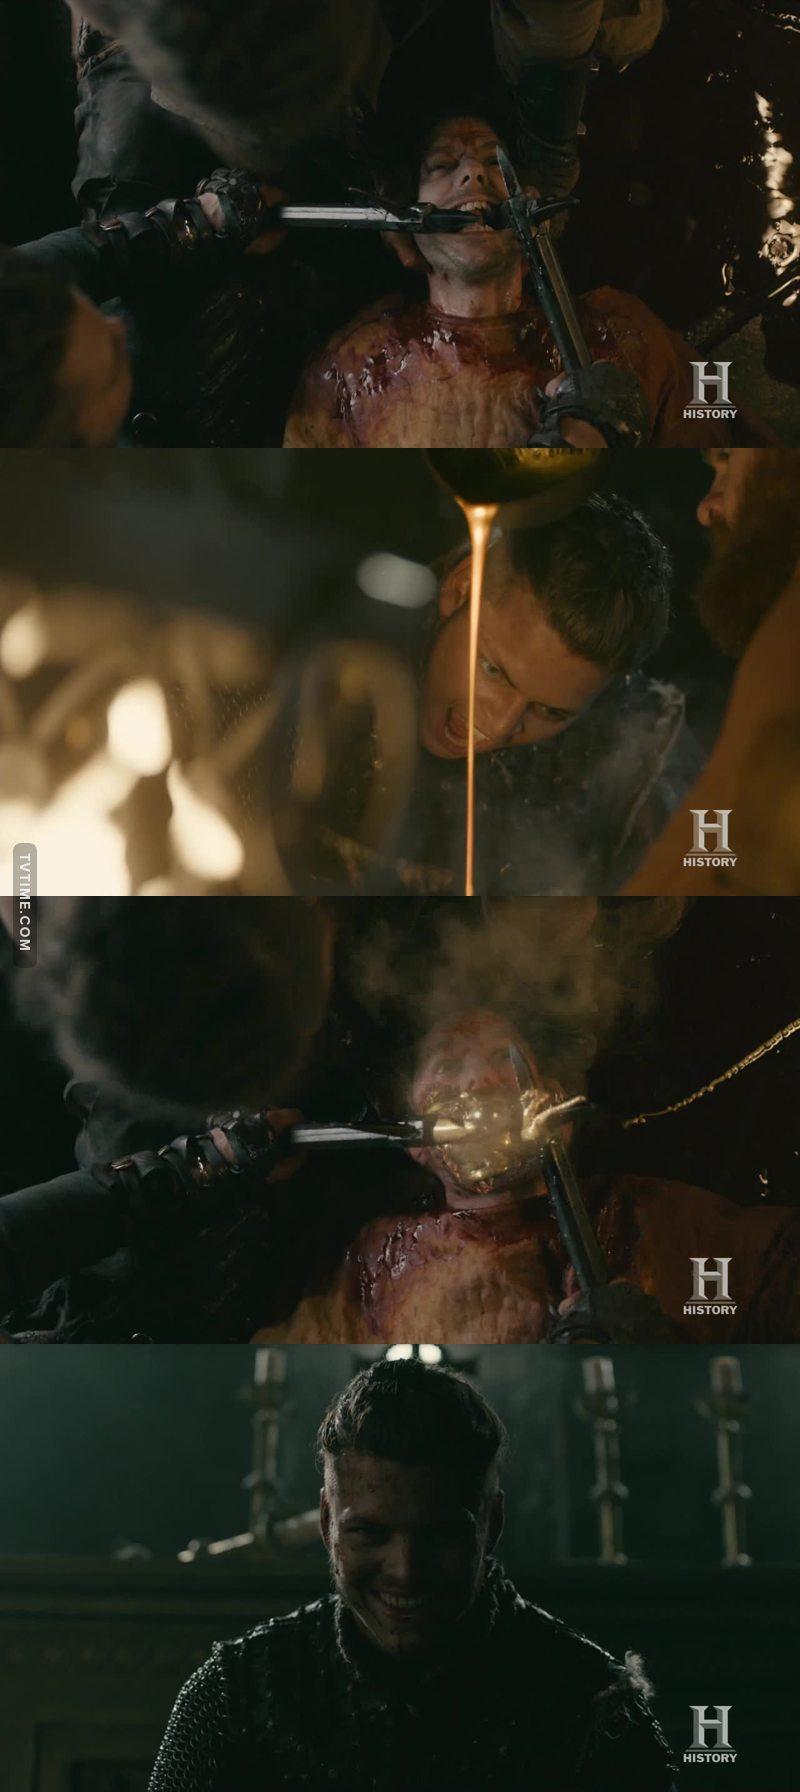 Khal Drogo would be proud 😂 #GoT